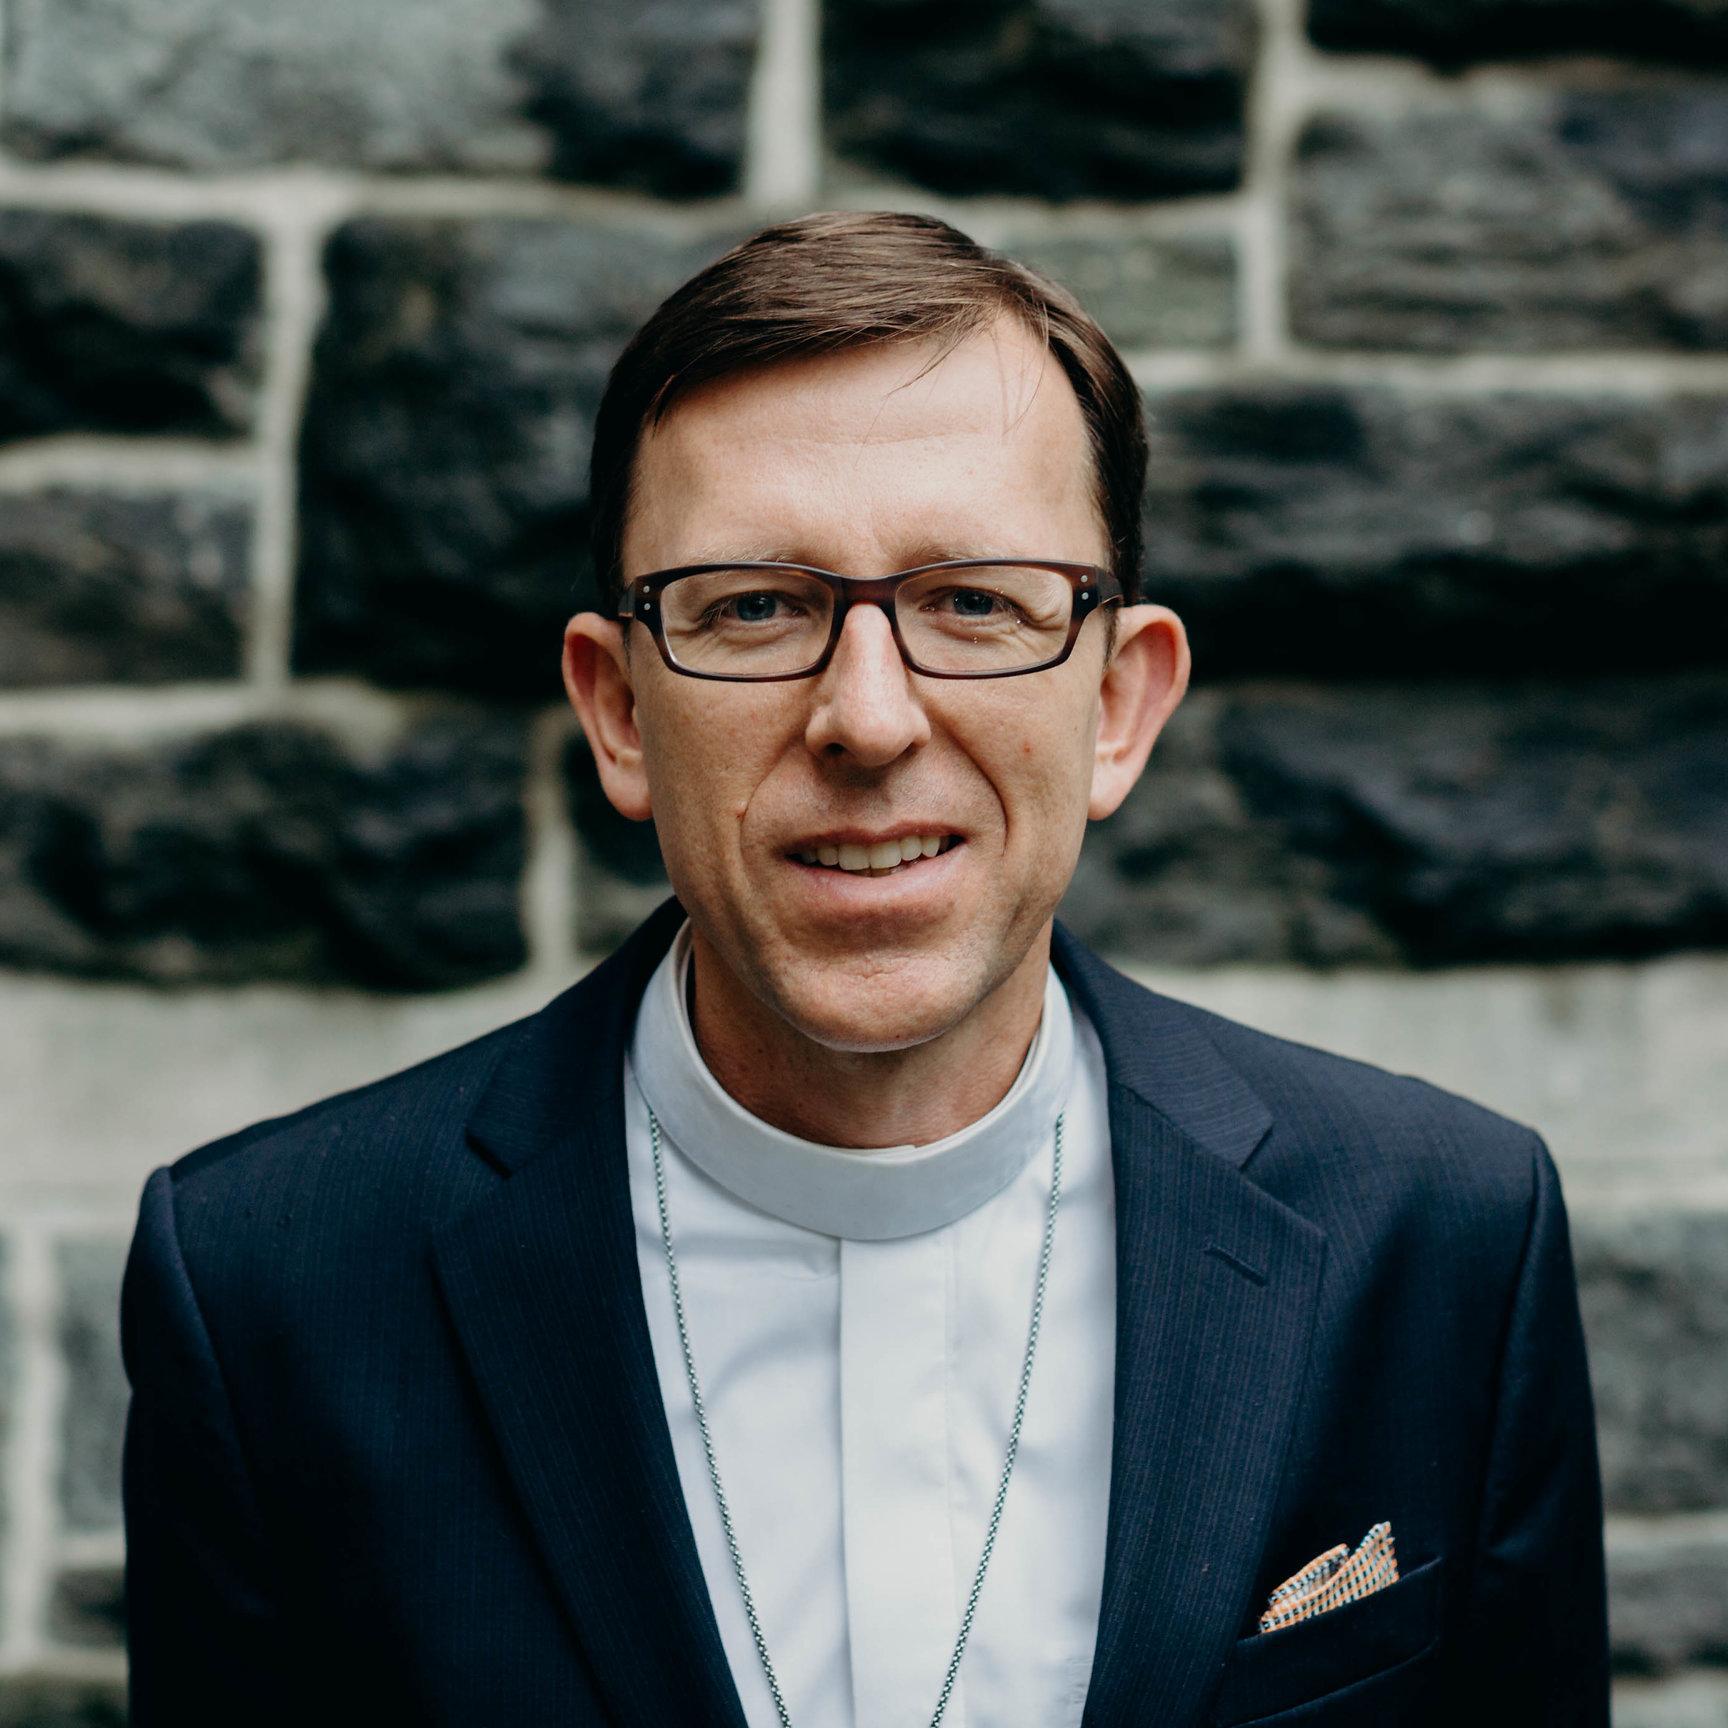 DAN CLAIRE  Senior Pastor, Church of the Resurrection, Washington D.C.